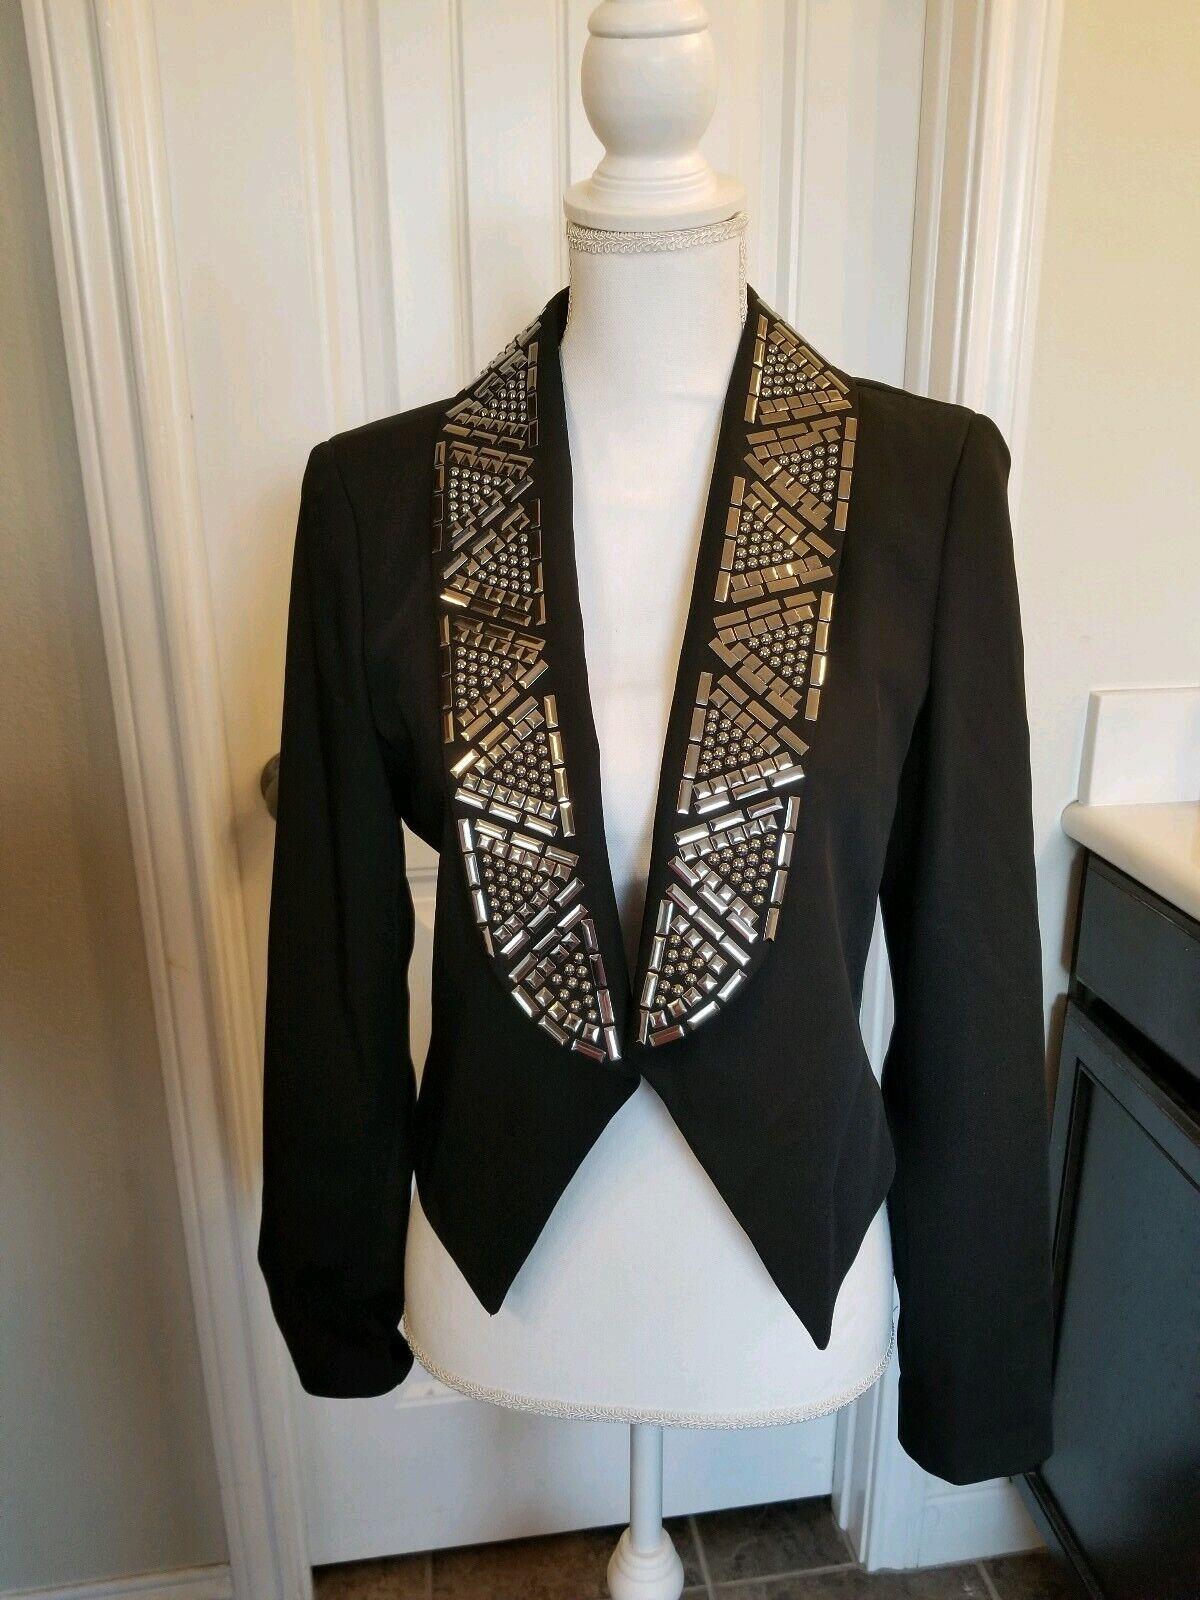 Bebe cropped jacket with shiny metal neckline